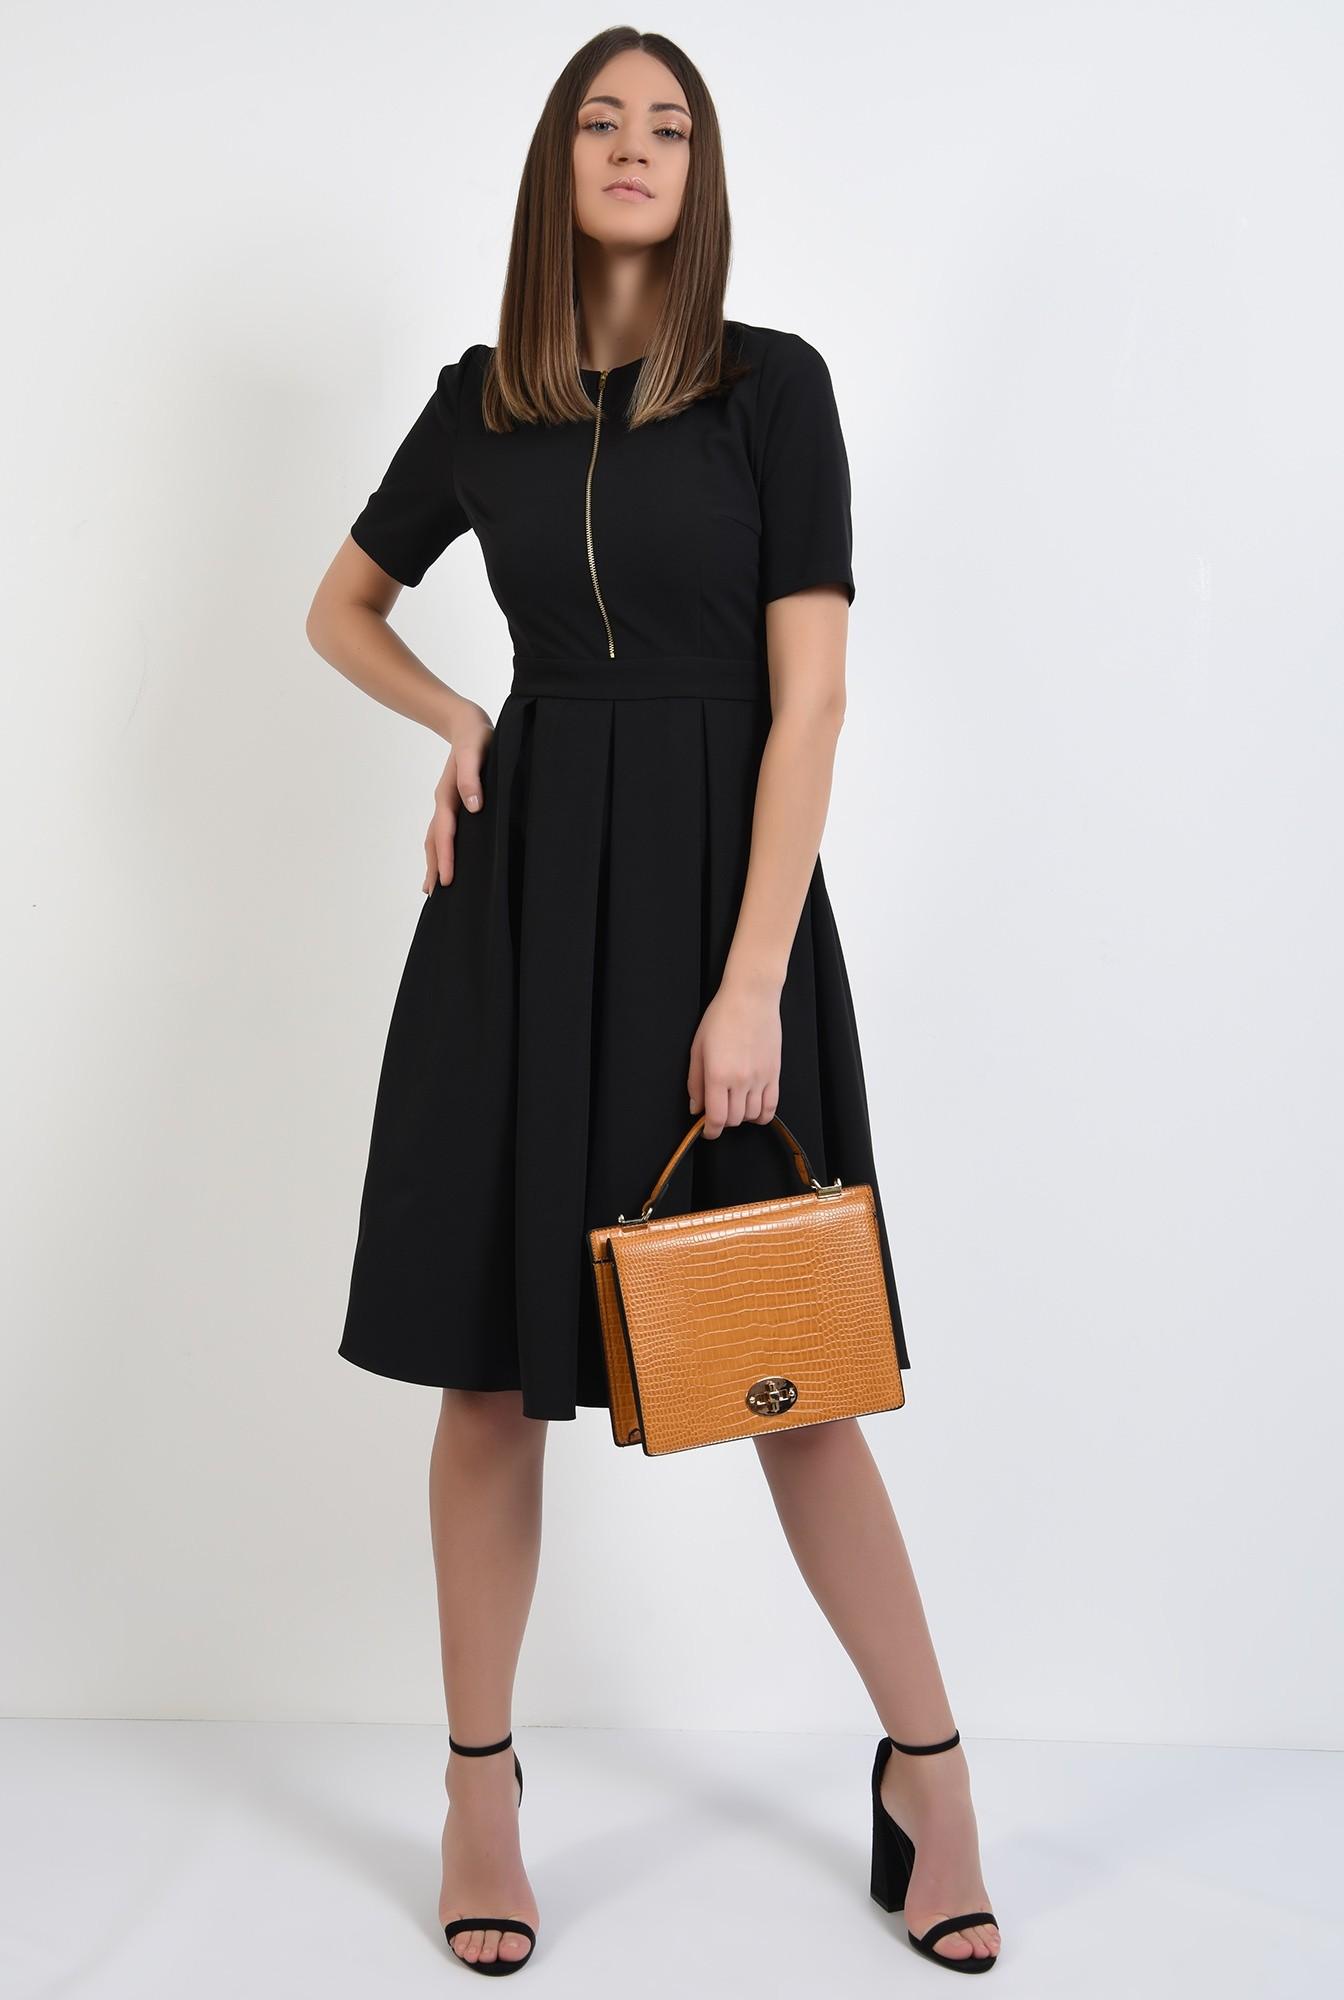 3 - rochie neagra, office, midi, evazata, cu fermoar metalic